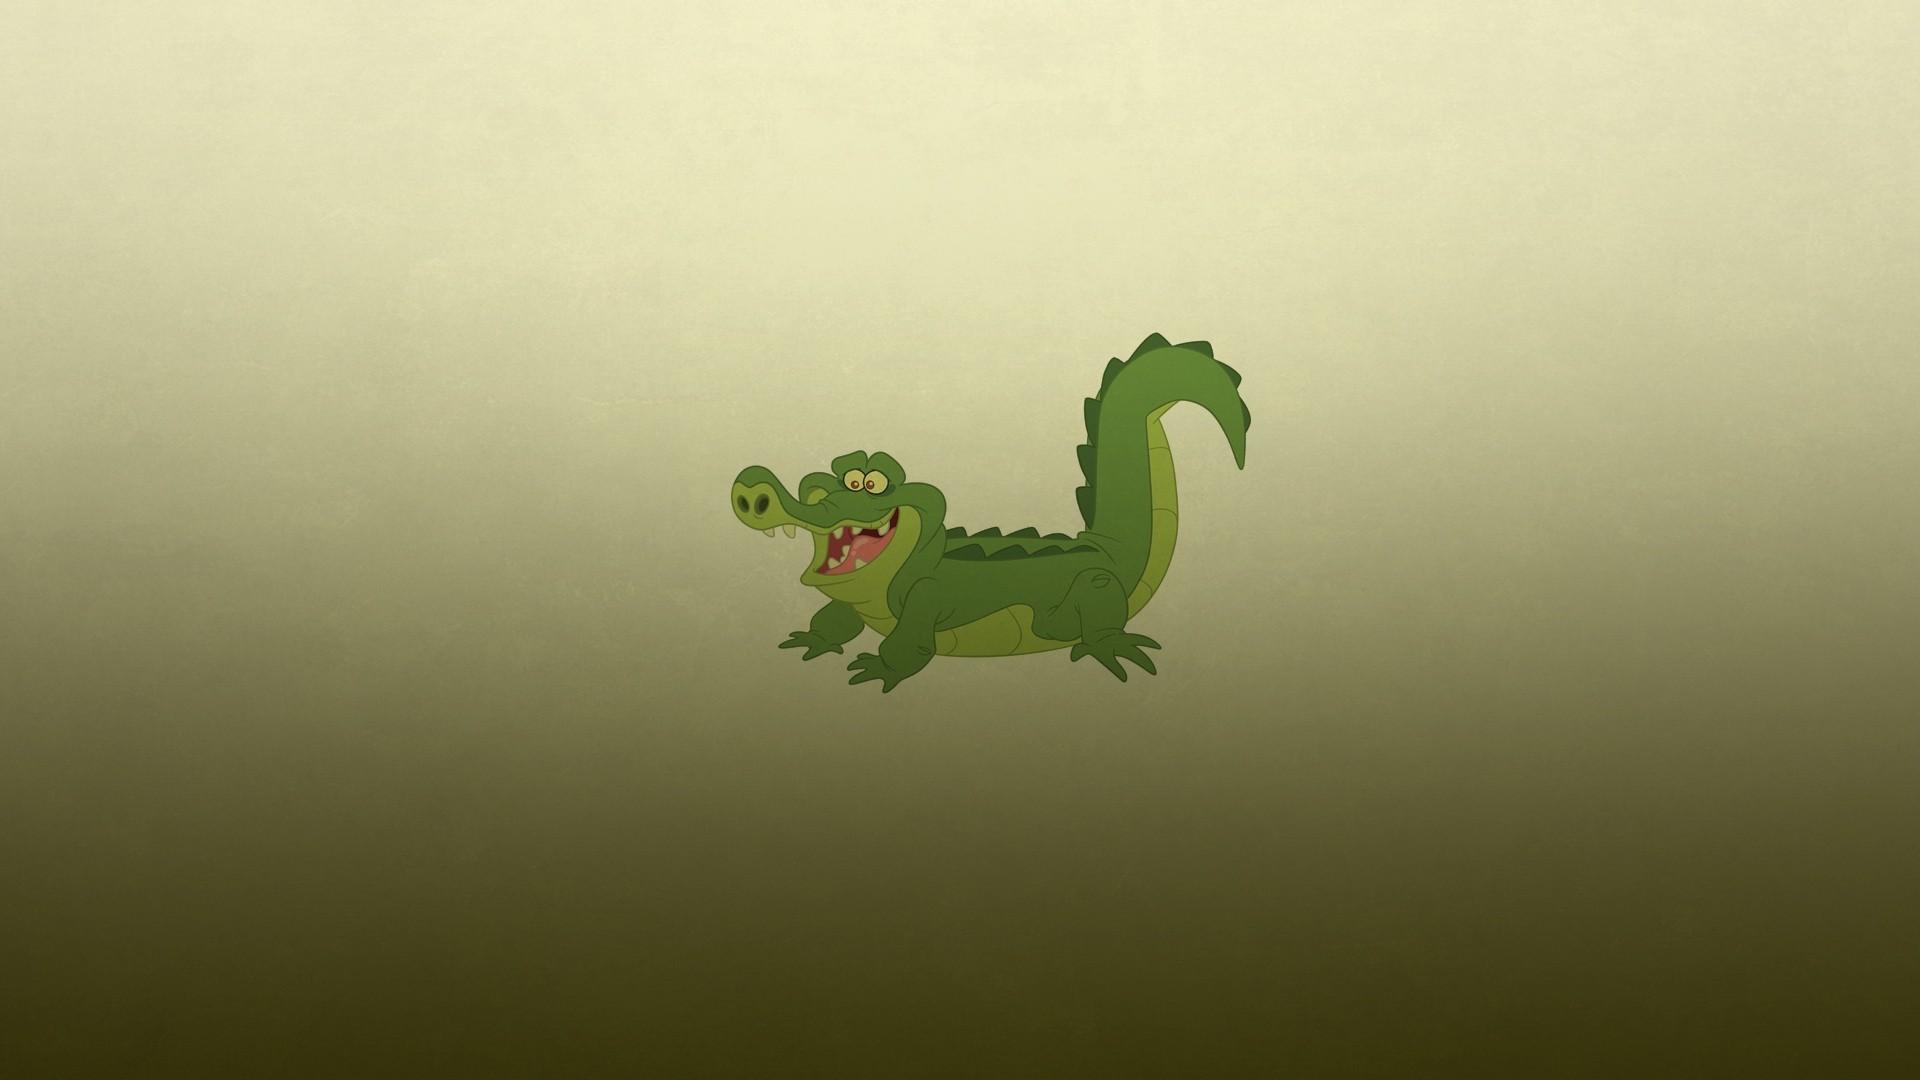 Minimalist Dinosaur Wallpaper For Pc